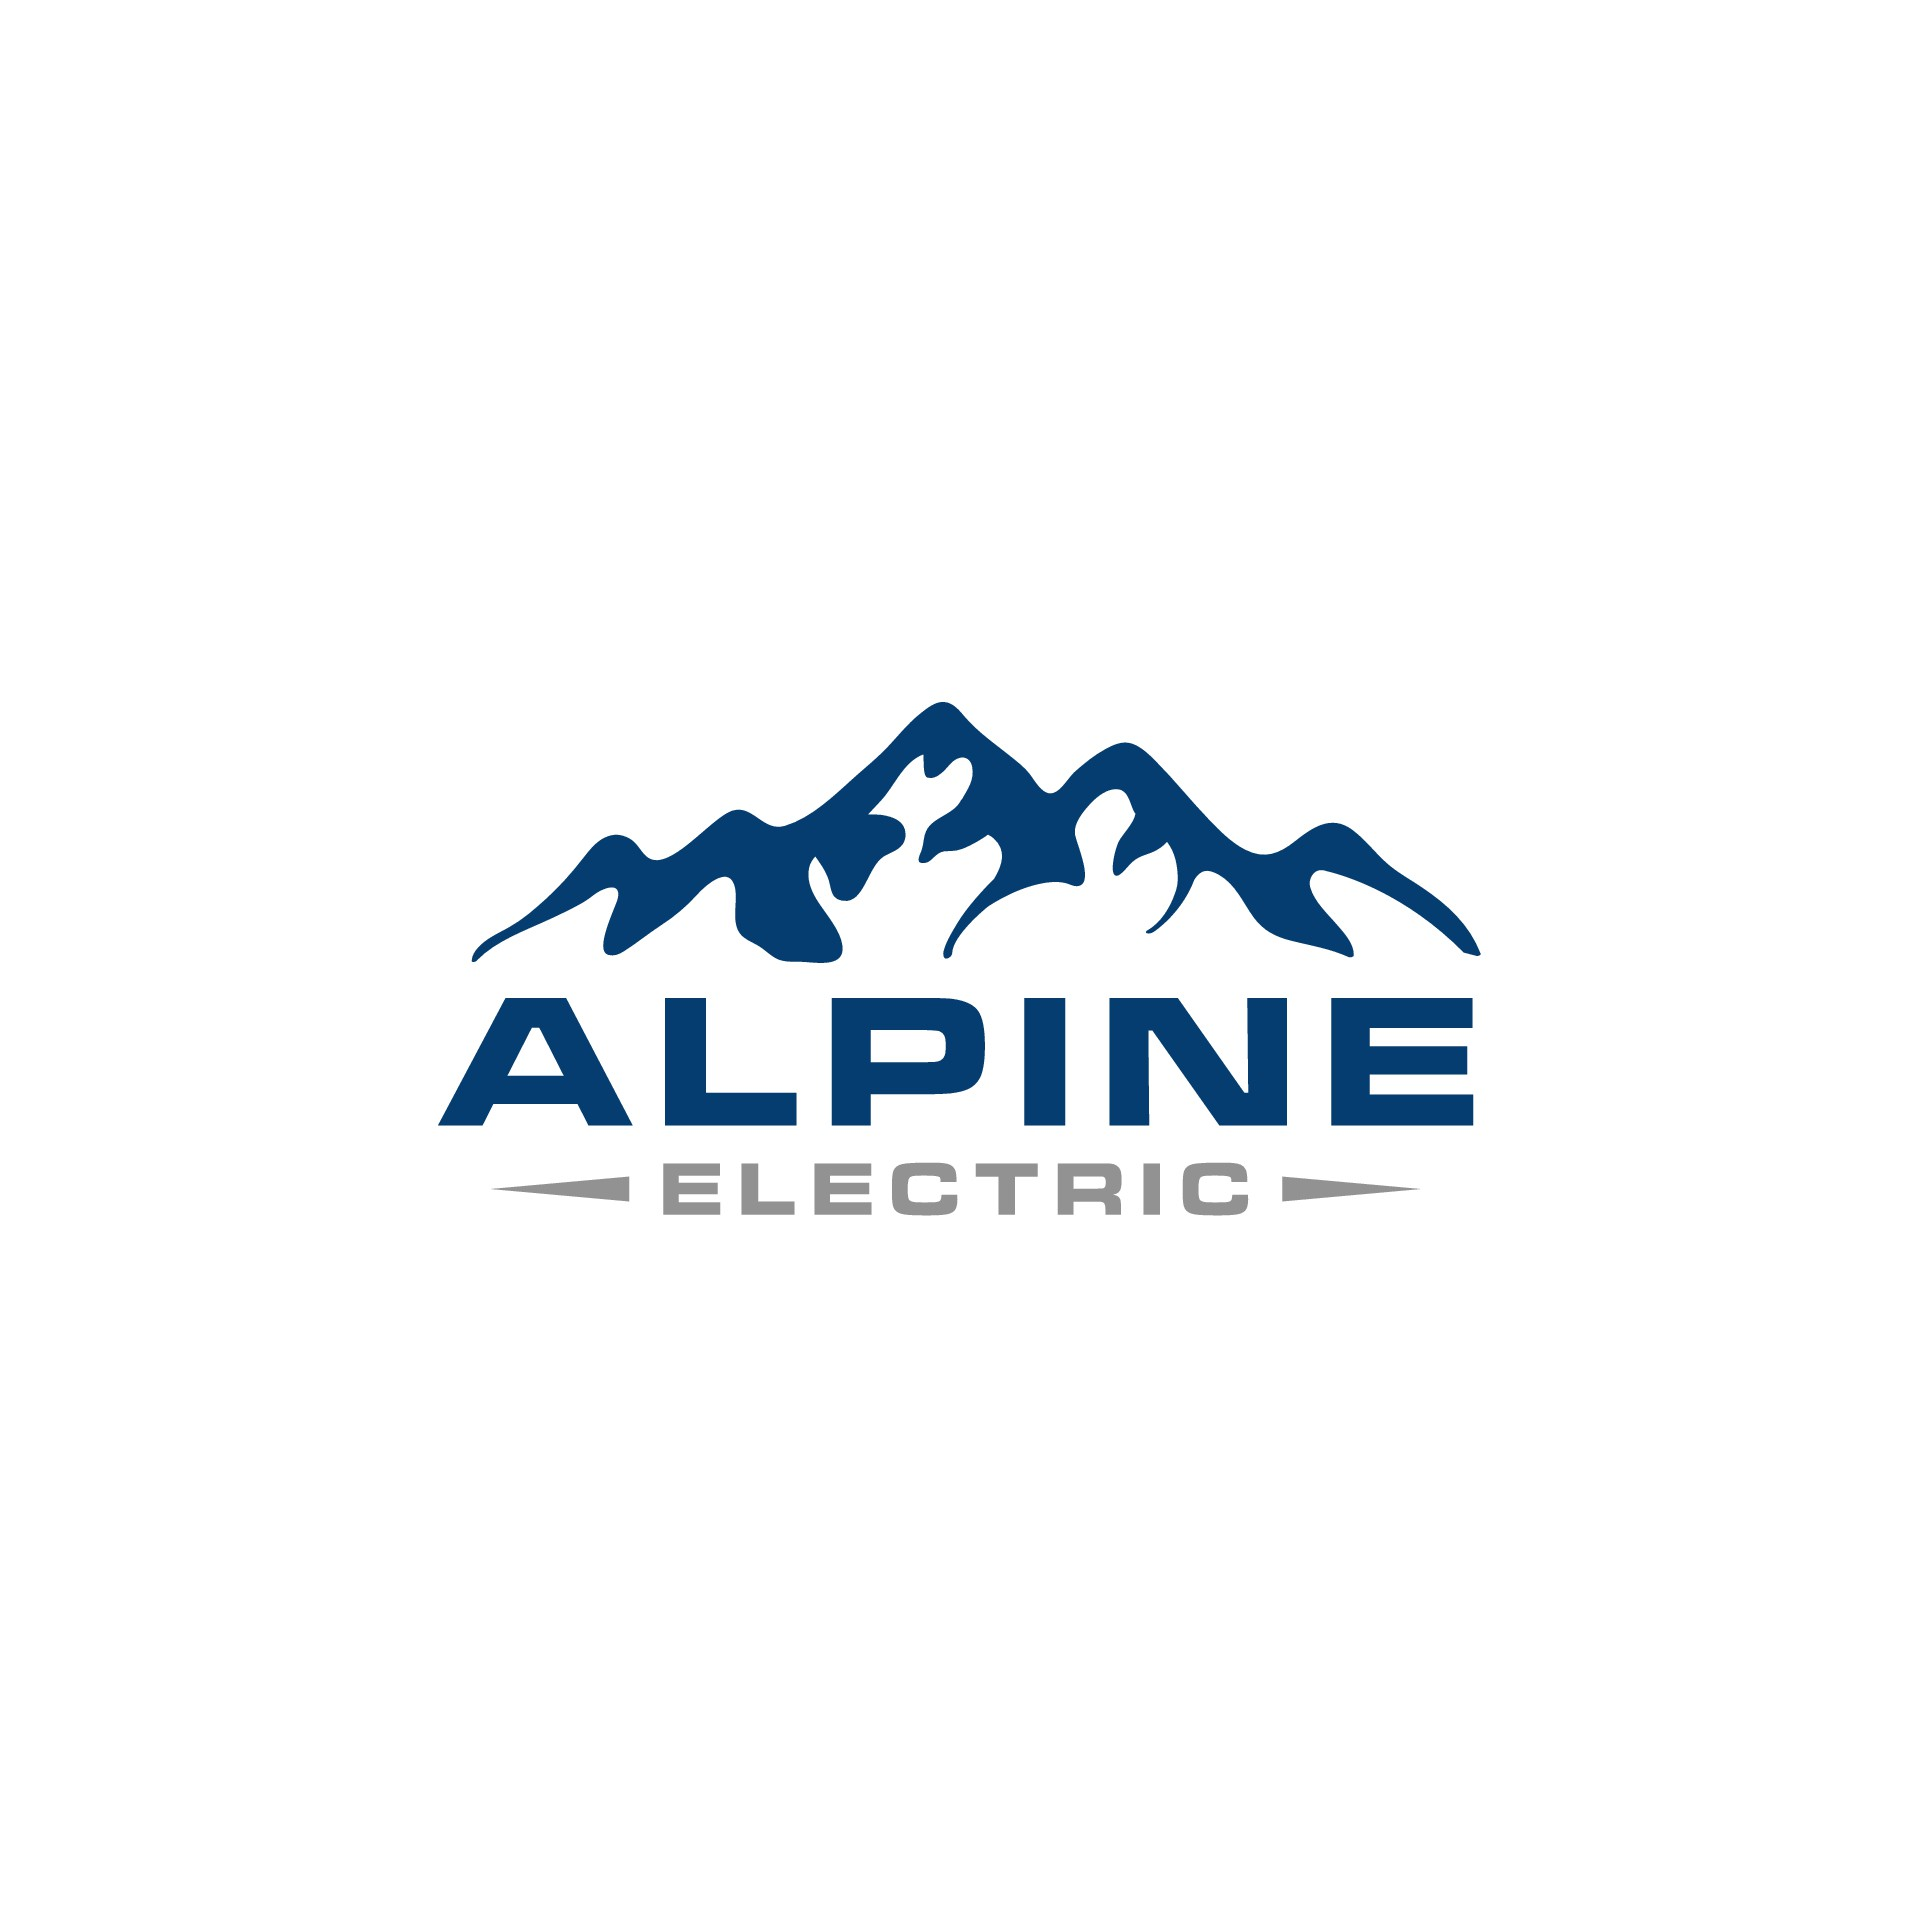 Electrical Company Logo Design